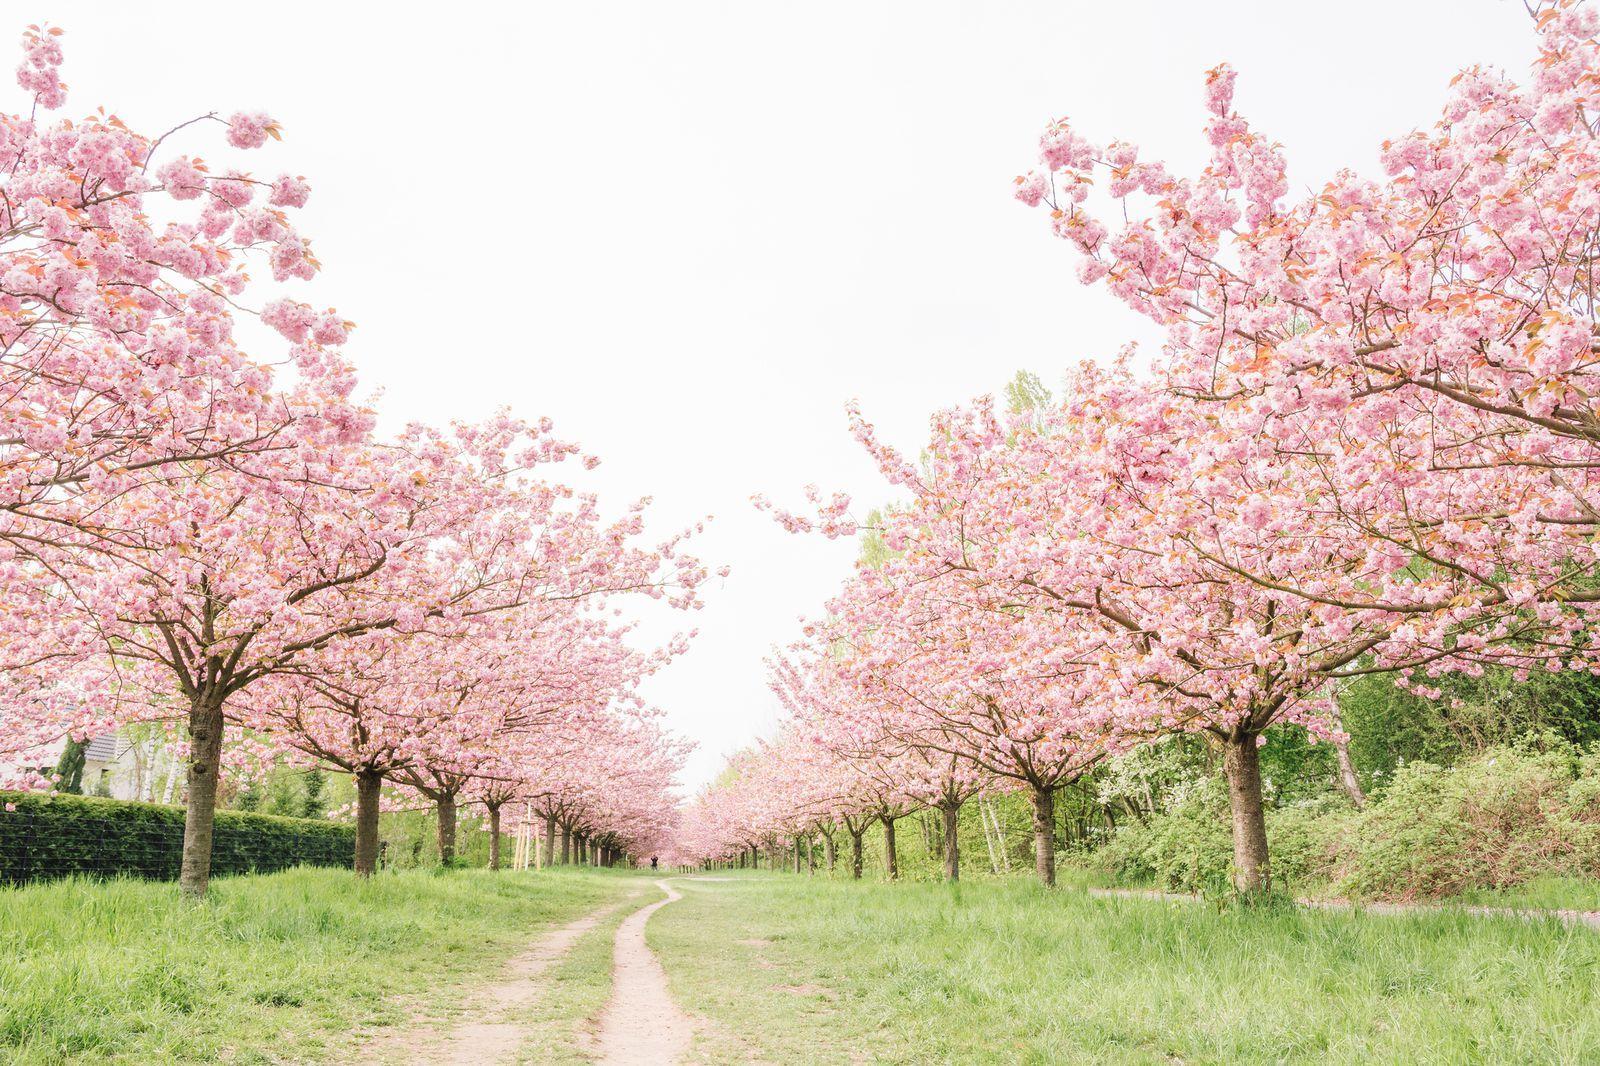 Cherry Blossom Tree Facts That You Definitely Never Knew Before Pink Blossom Tree Cherry Blooms Cherry Blossom Tree